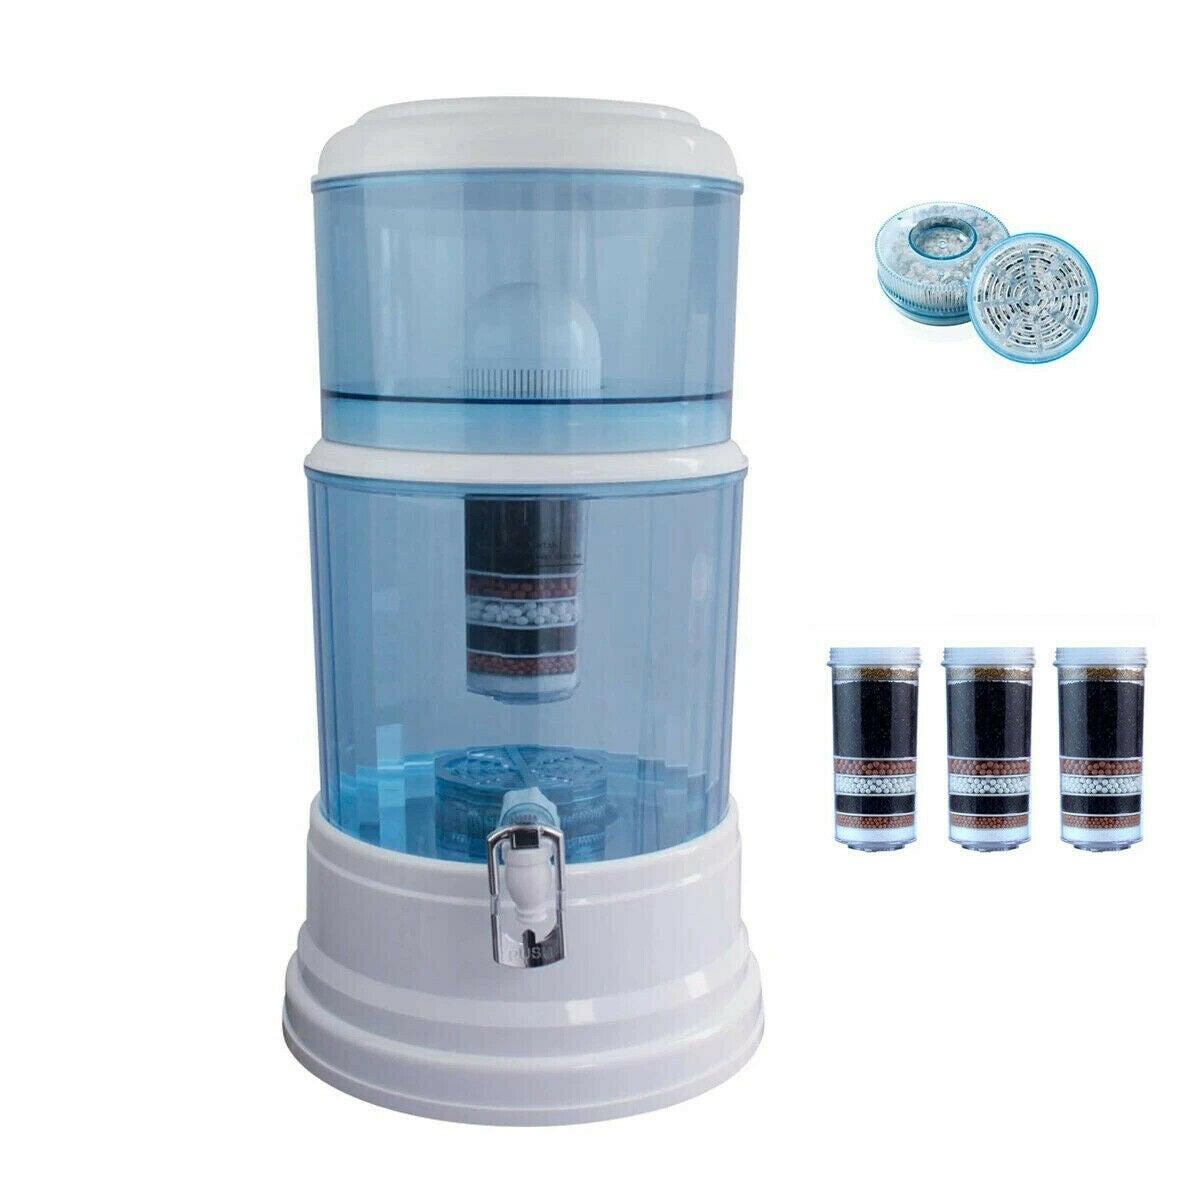 20L Aimex Water Purifier + 2 X 8 Stage Water Filter + Maifan Stone Dispenser